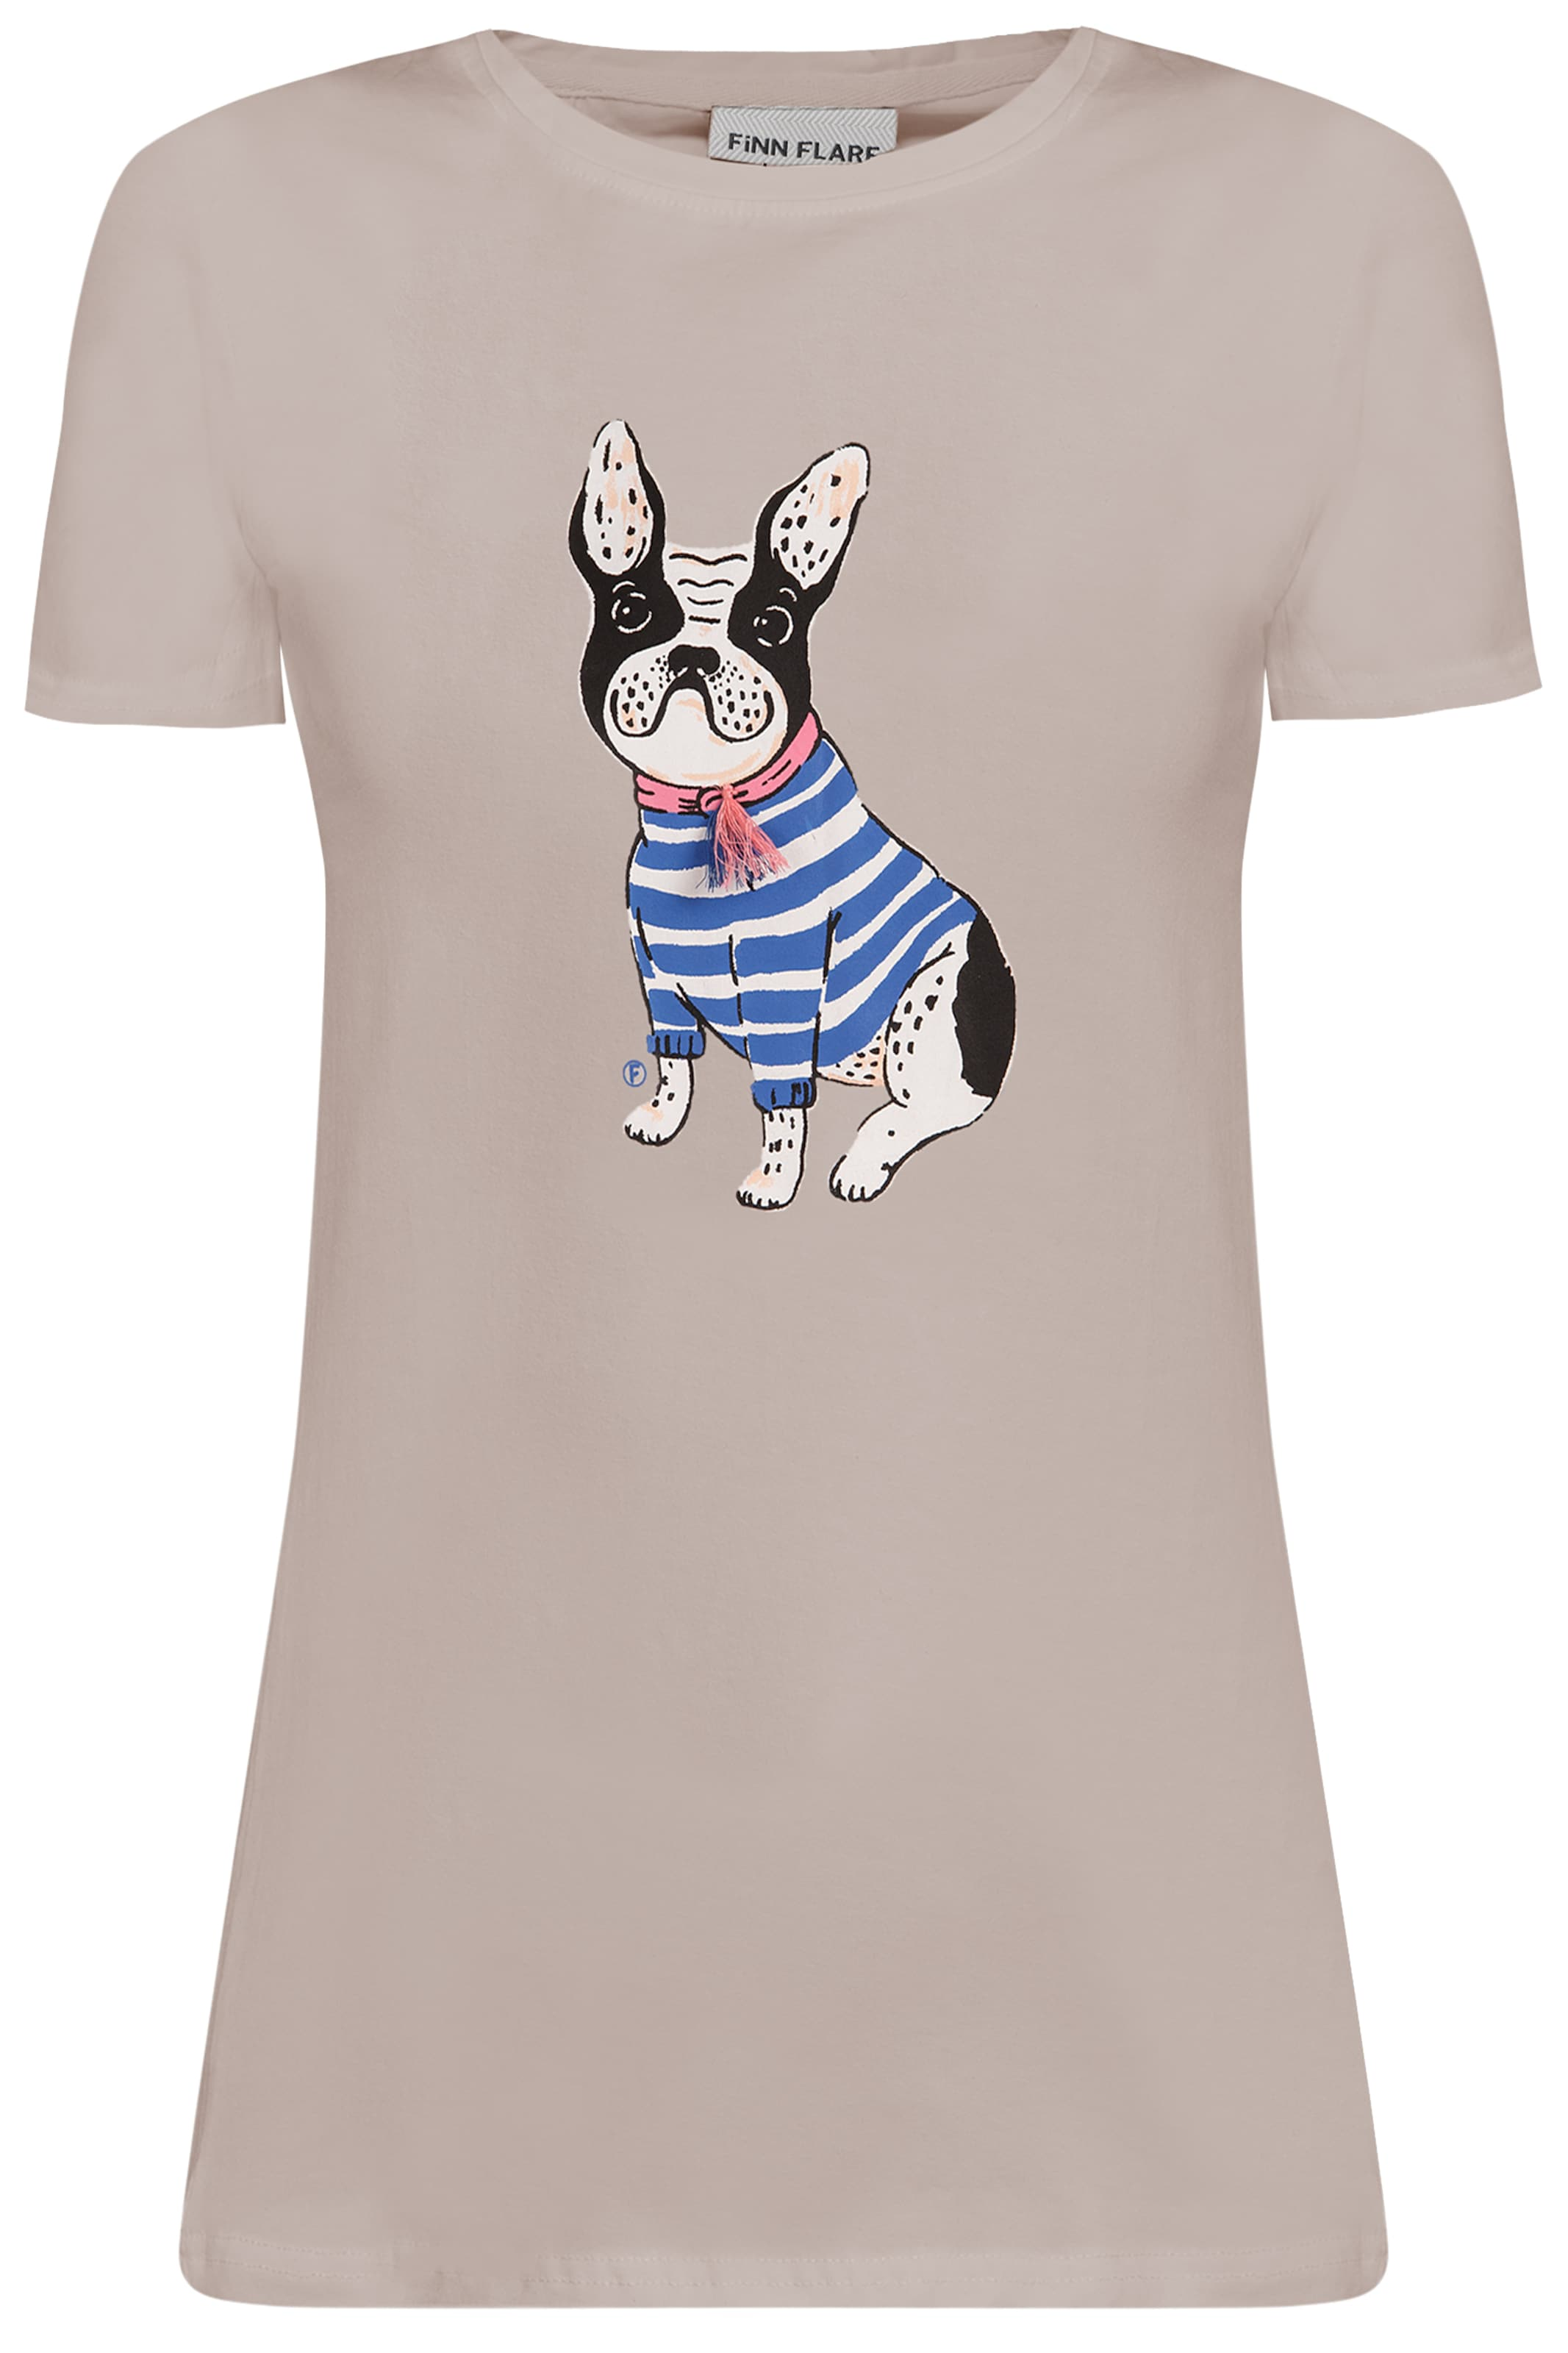 CamelMischfarben Finn shirt Flare T In shtQdrCx